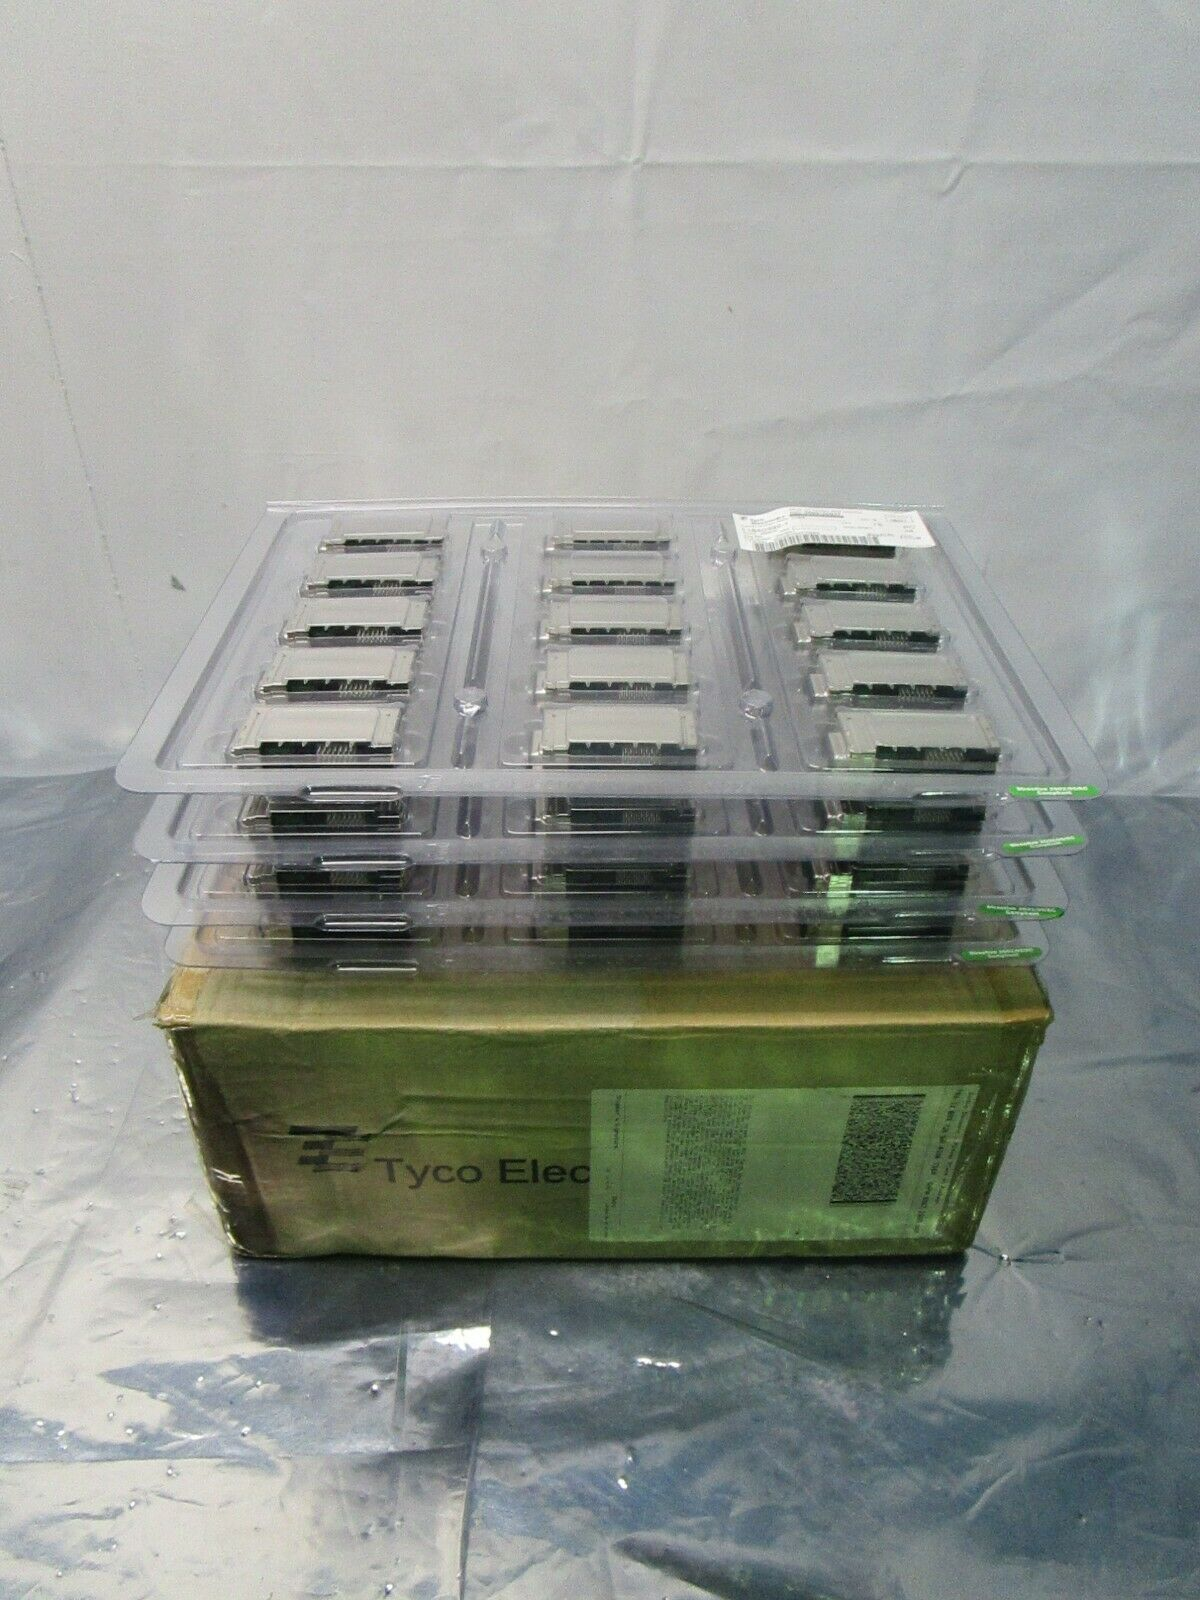 1 Lot of 60 Tyco Electronics 1840392-1 TE Connectivity MRJ21 1X1 9G34, 102483